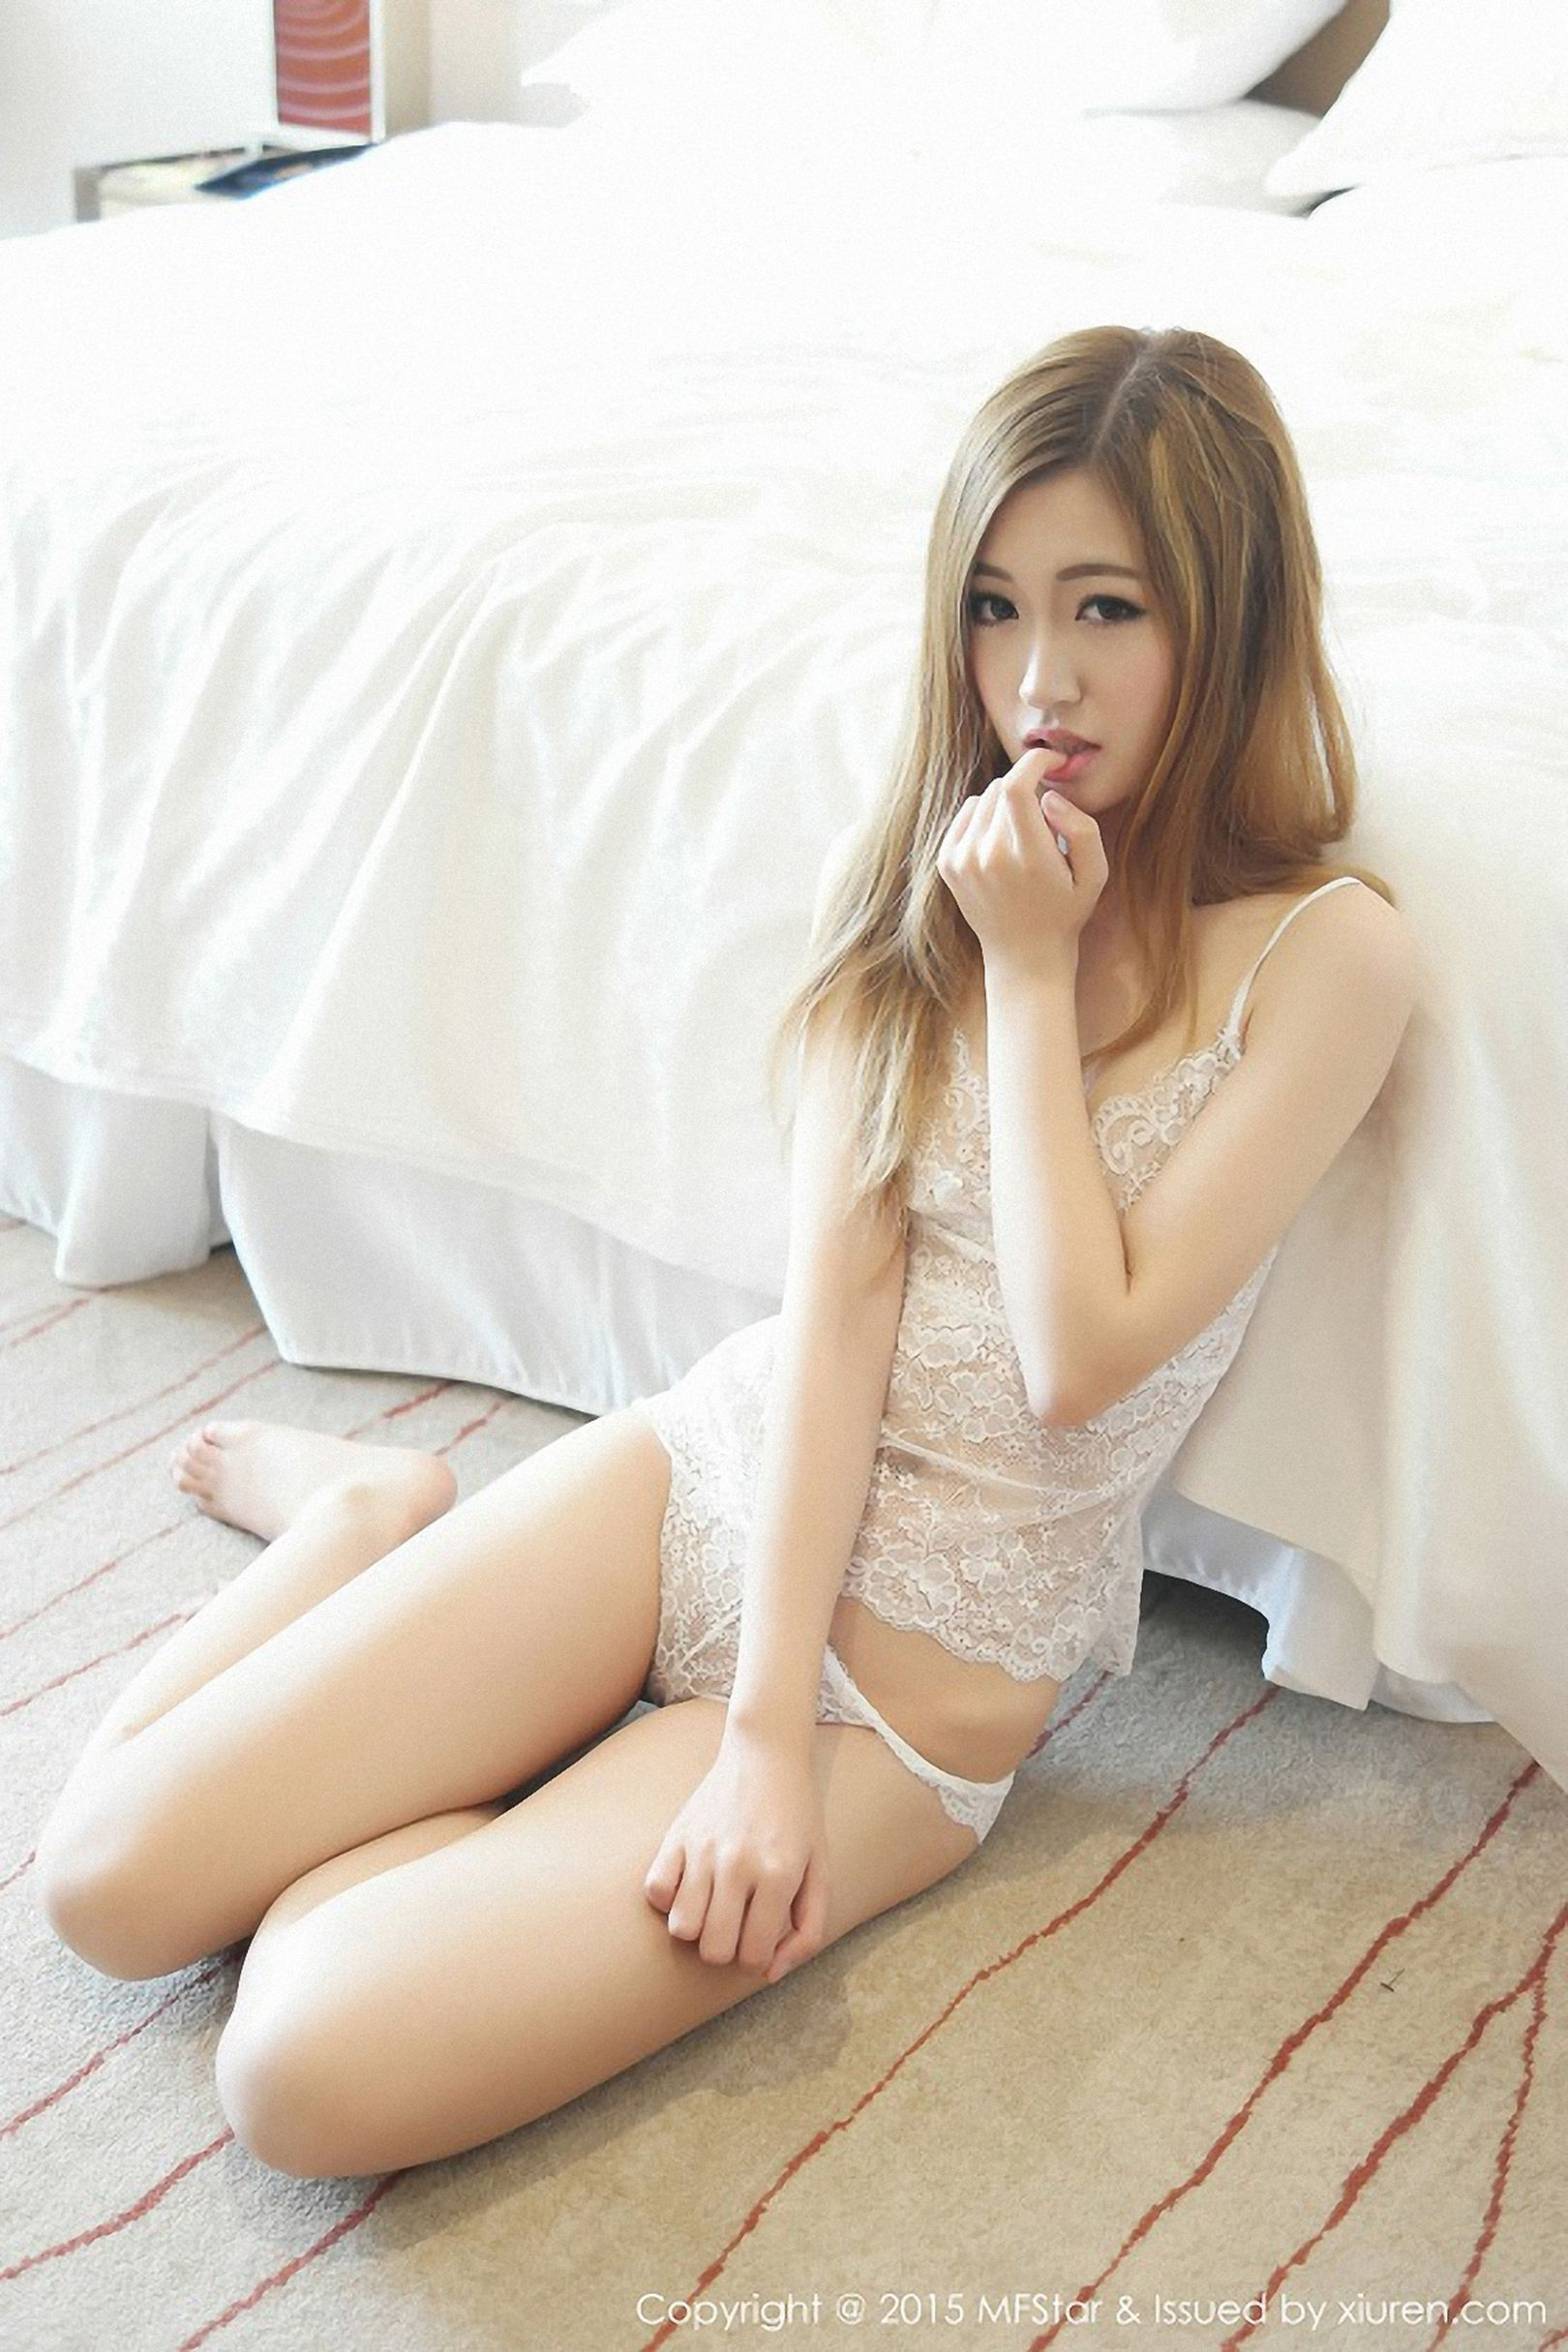 [MFStar模范学院] Vol.008 沈梦瑶 - 私房丝袜美图[42P]